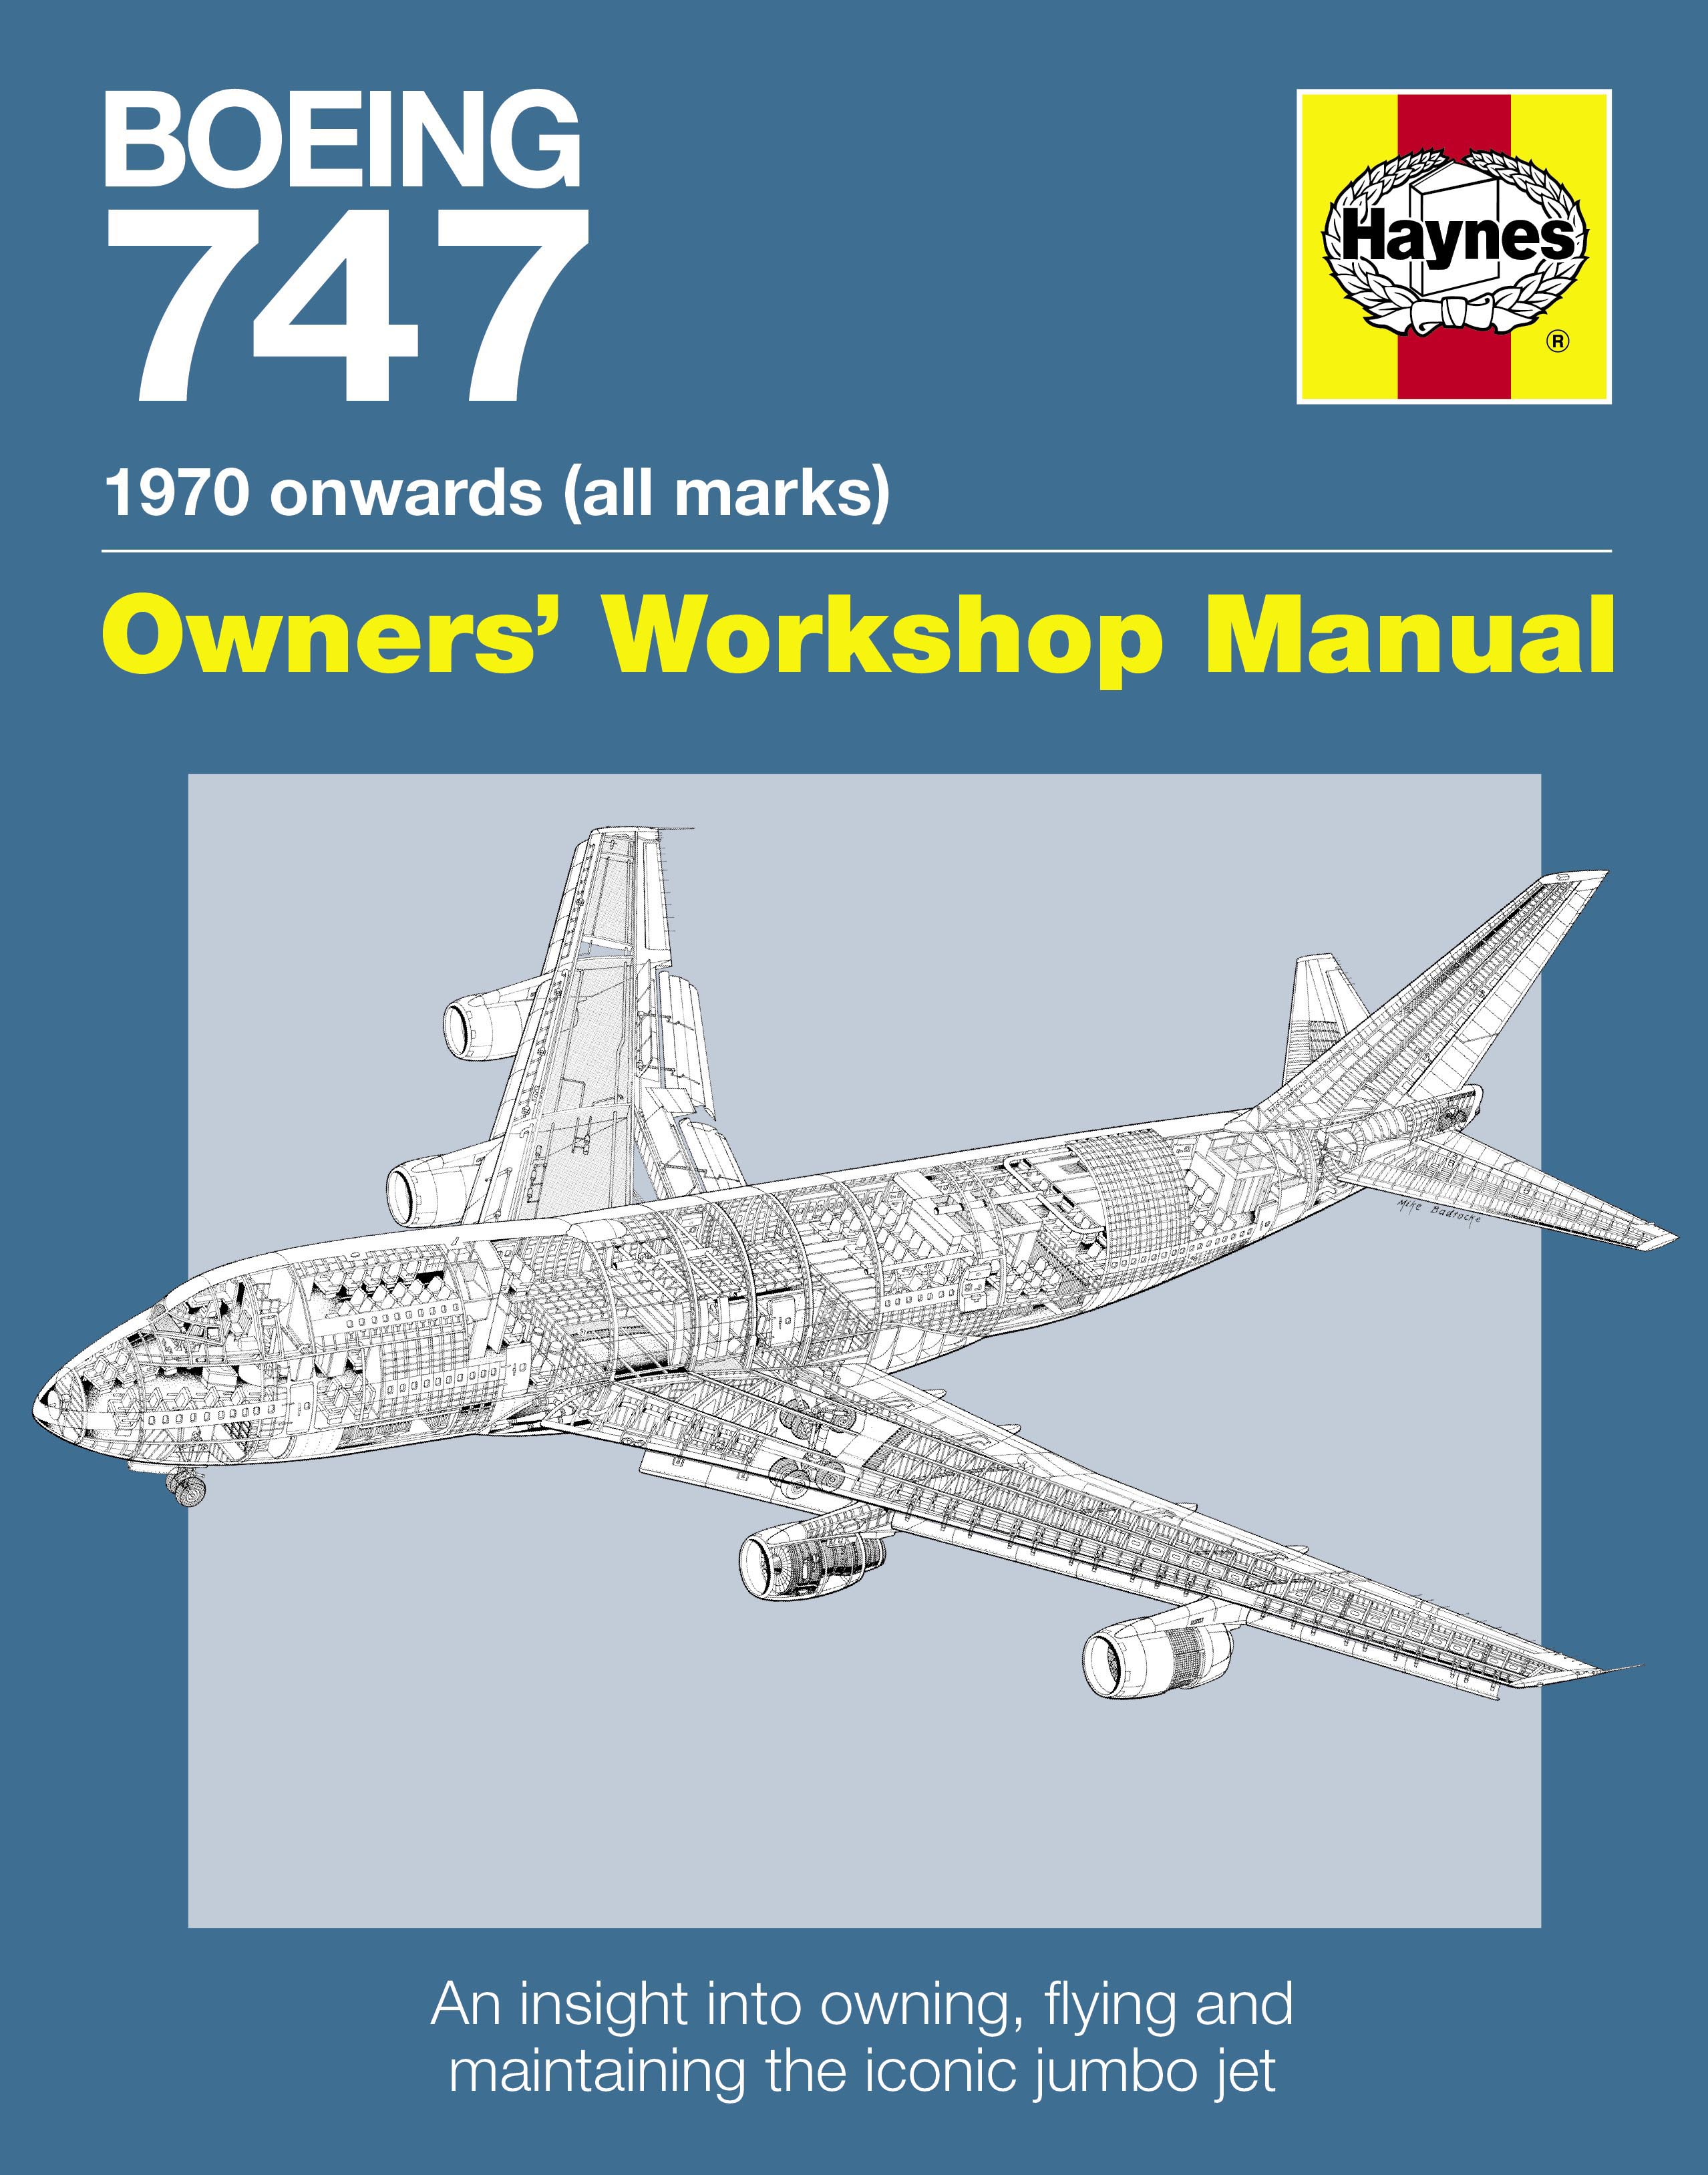 boeing 747 manual paperback haynes publishing rh haynes com boeing 747 manual boeing 747 maintenance manual pdf